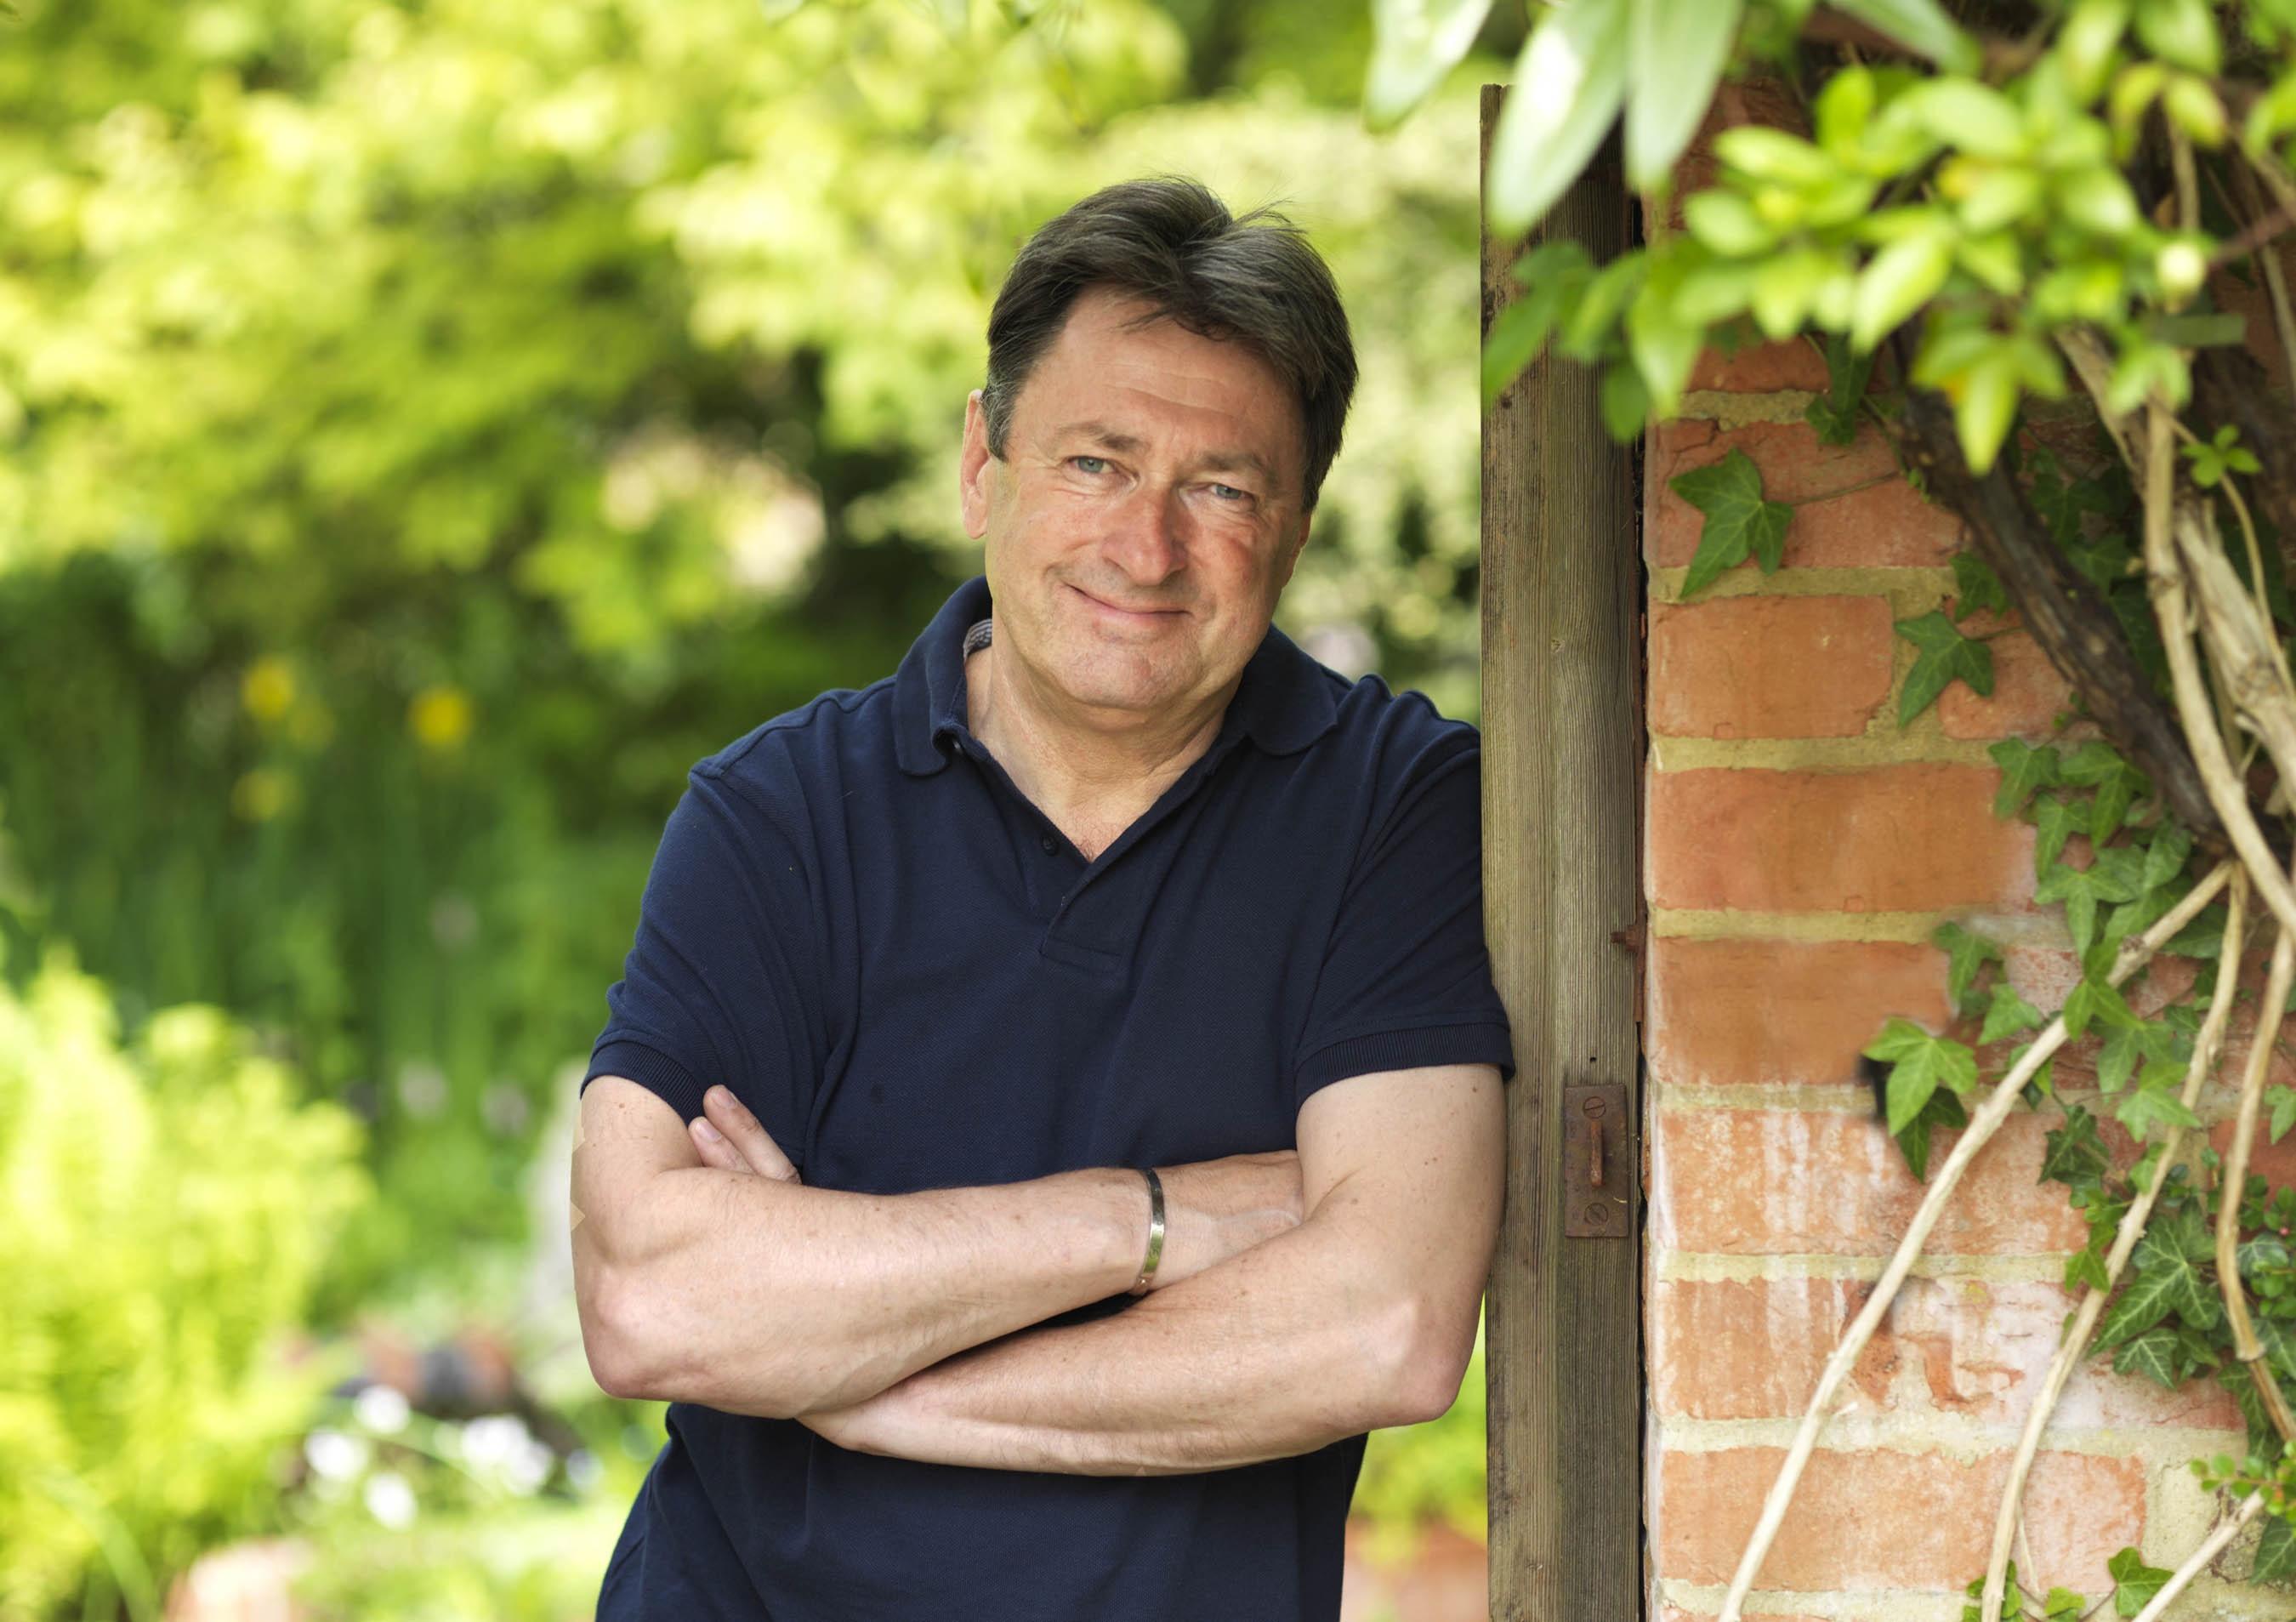 Alan Titchmarsh 39 S Joy At Love Your Garden Success